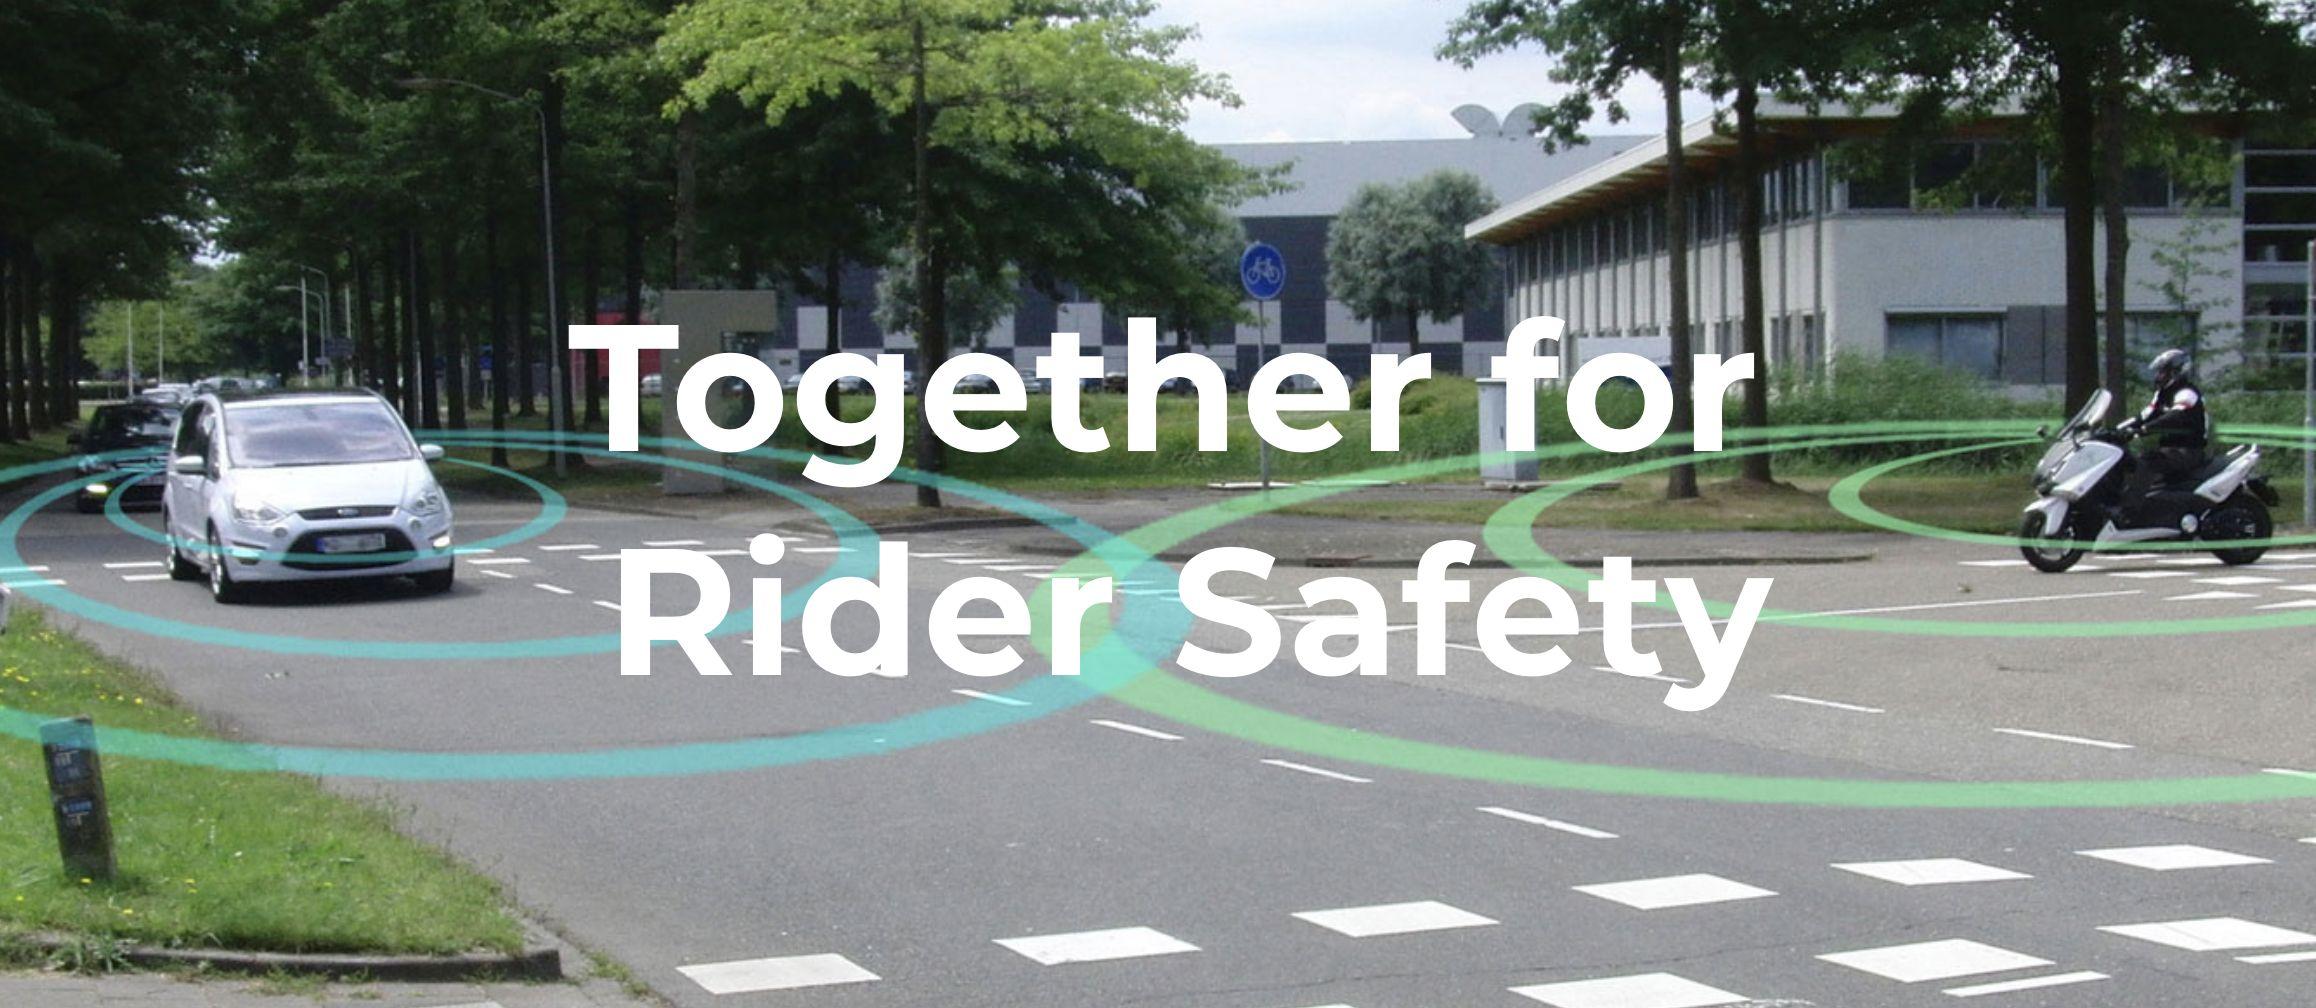 Connected Motorcycle Consortium.jpg